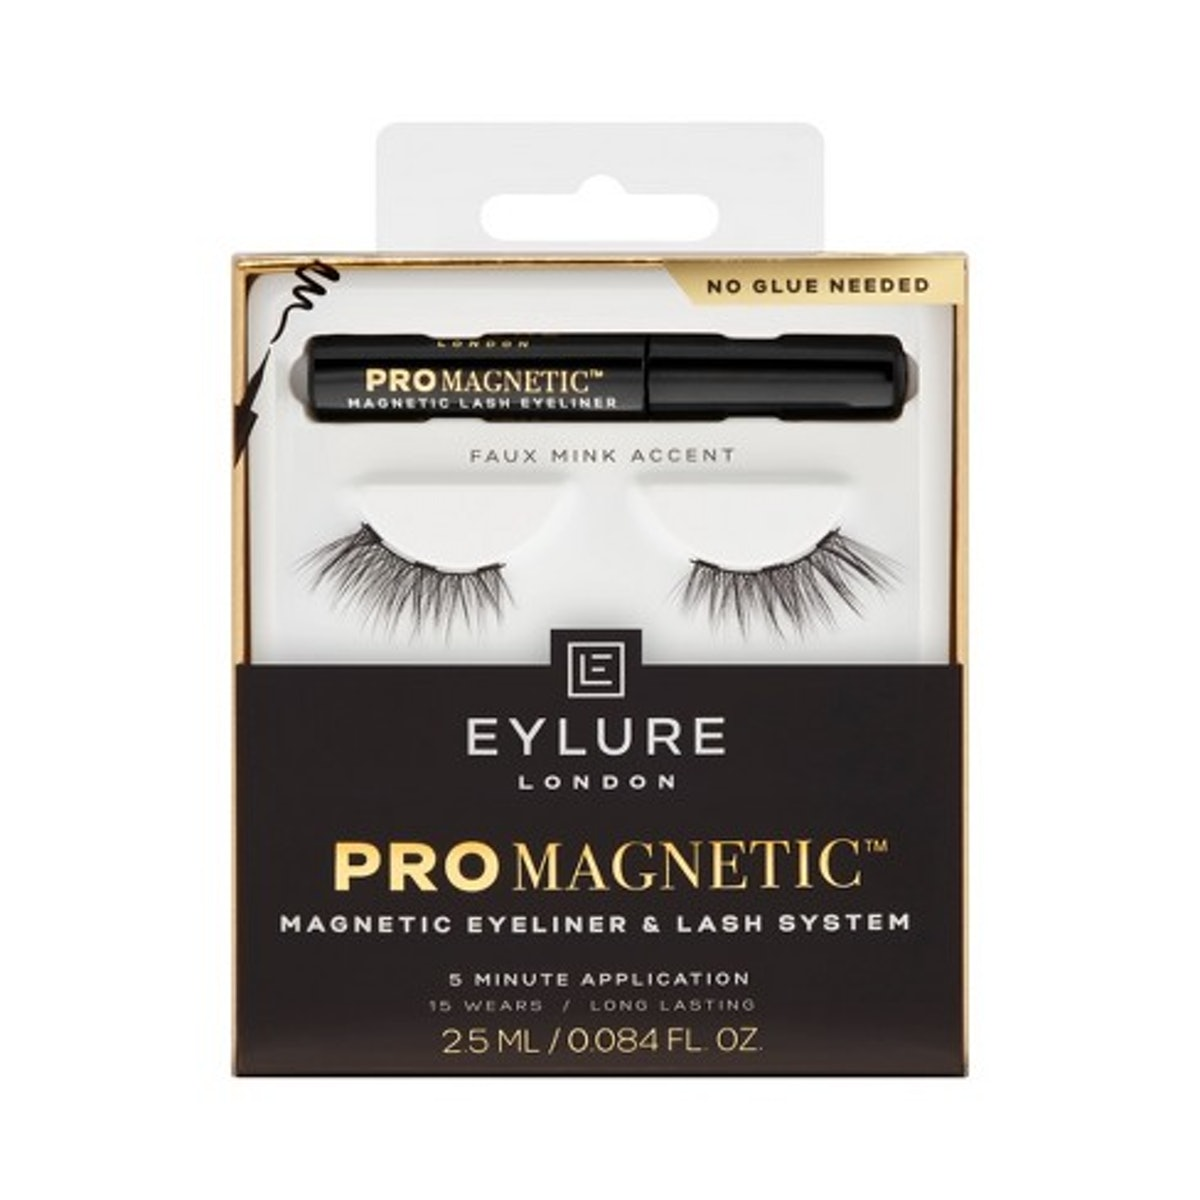 Eyelure ProMagnetic Liner Faux Mink Kit Accent